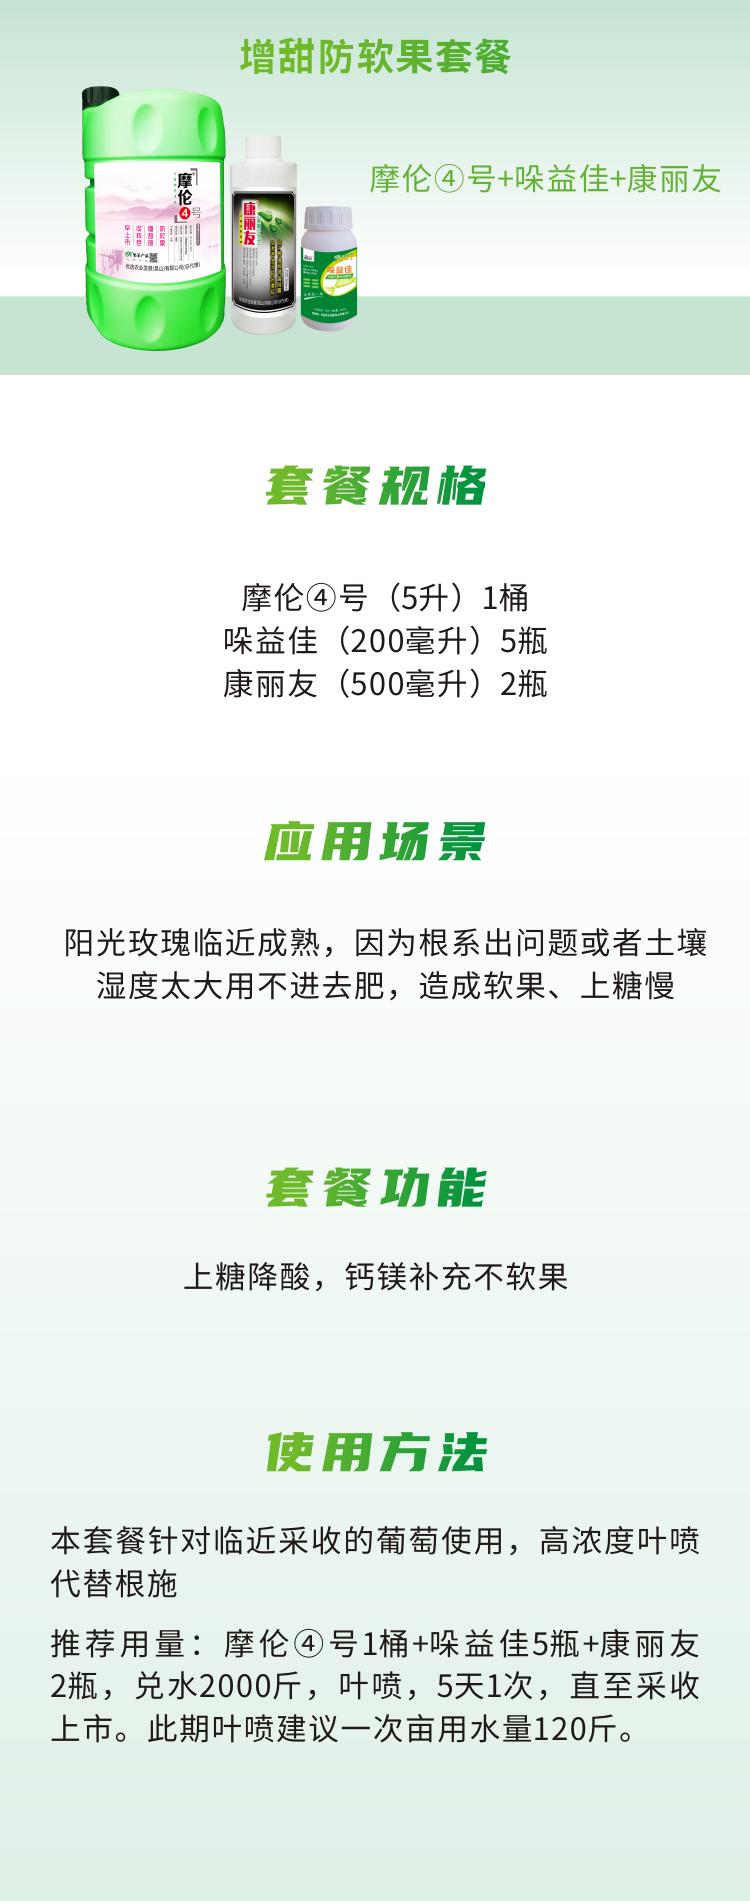 c4742290cfdb0ae71c41ff2364c7cee.png